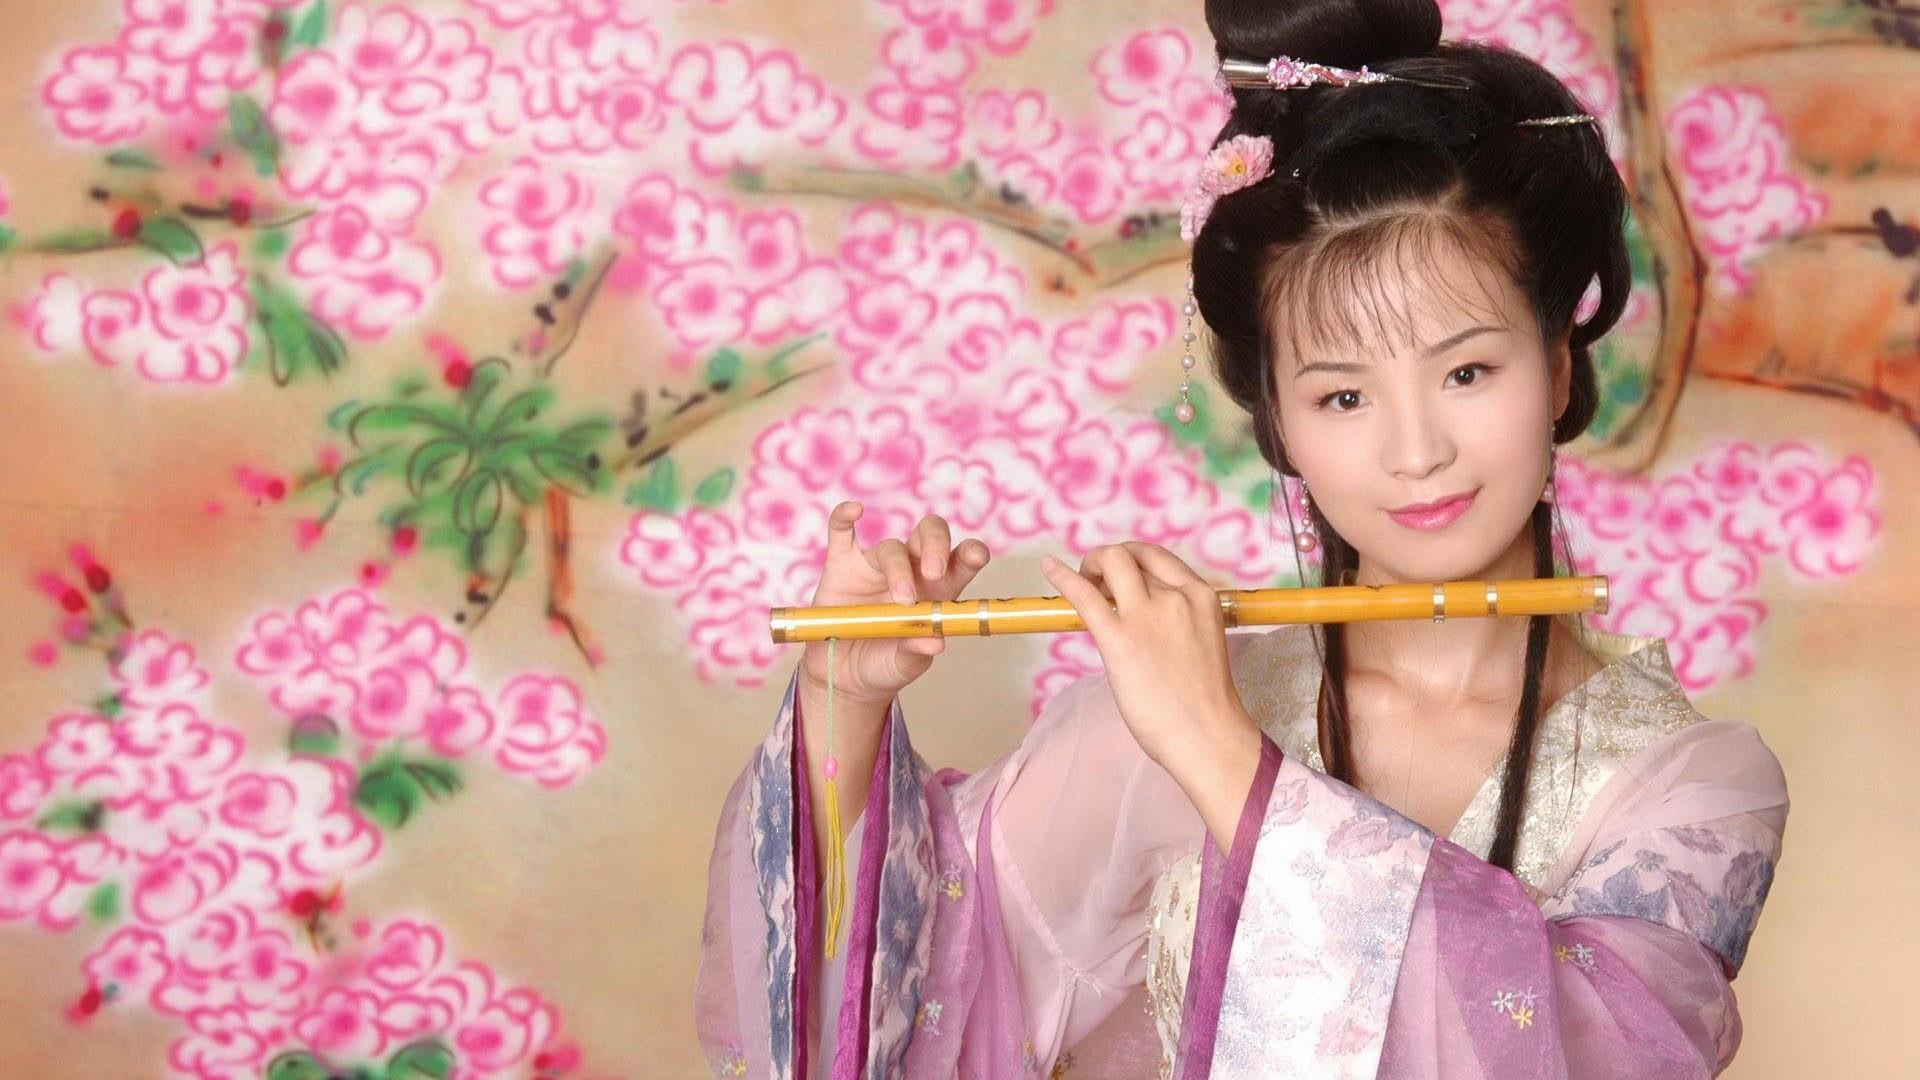 Vestuarios tradicionales china - 1920x1080